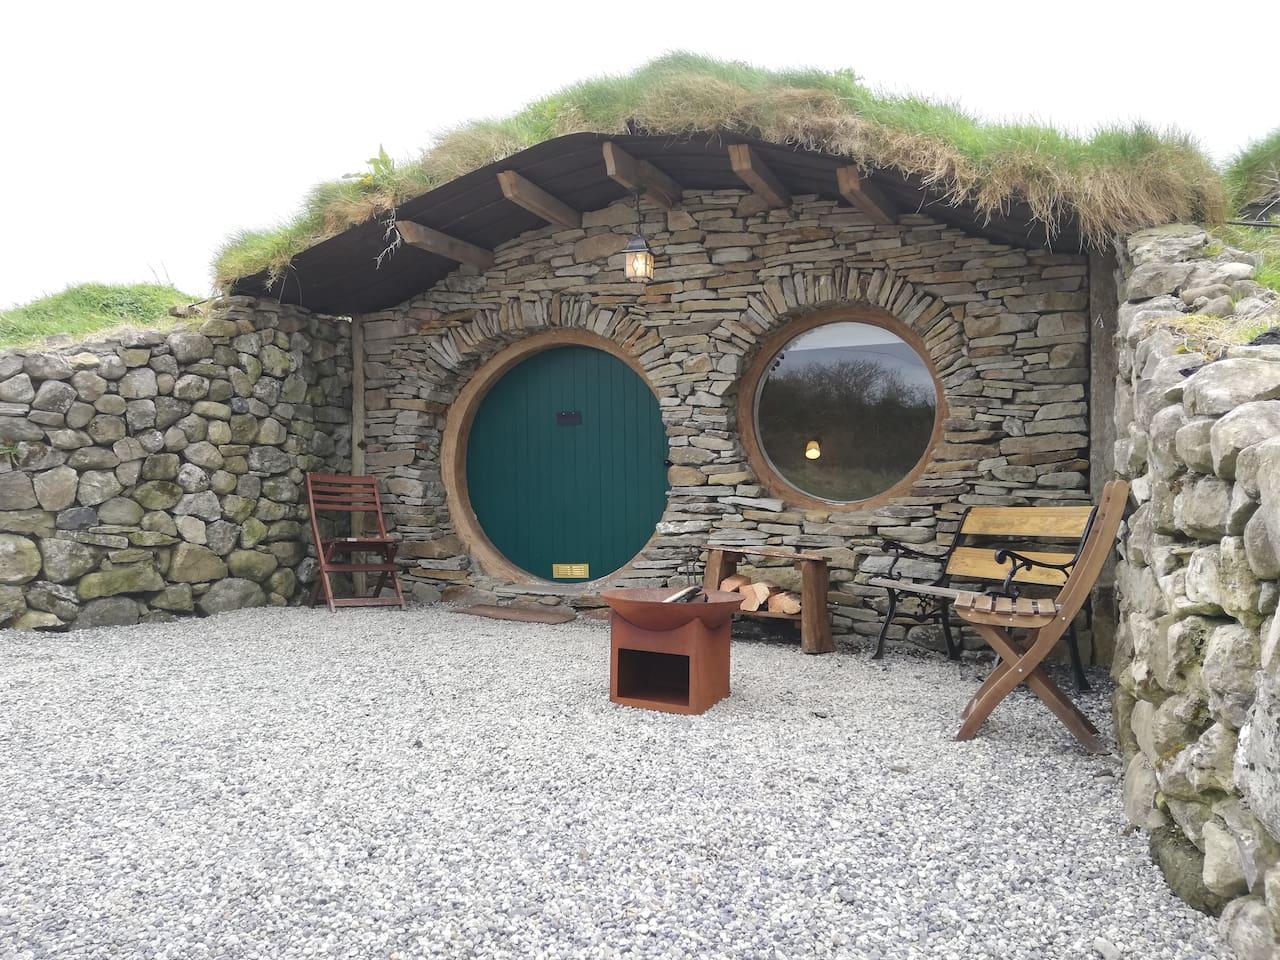 Exterior of the hobbit hut